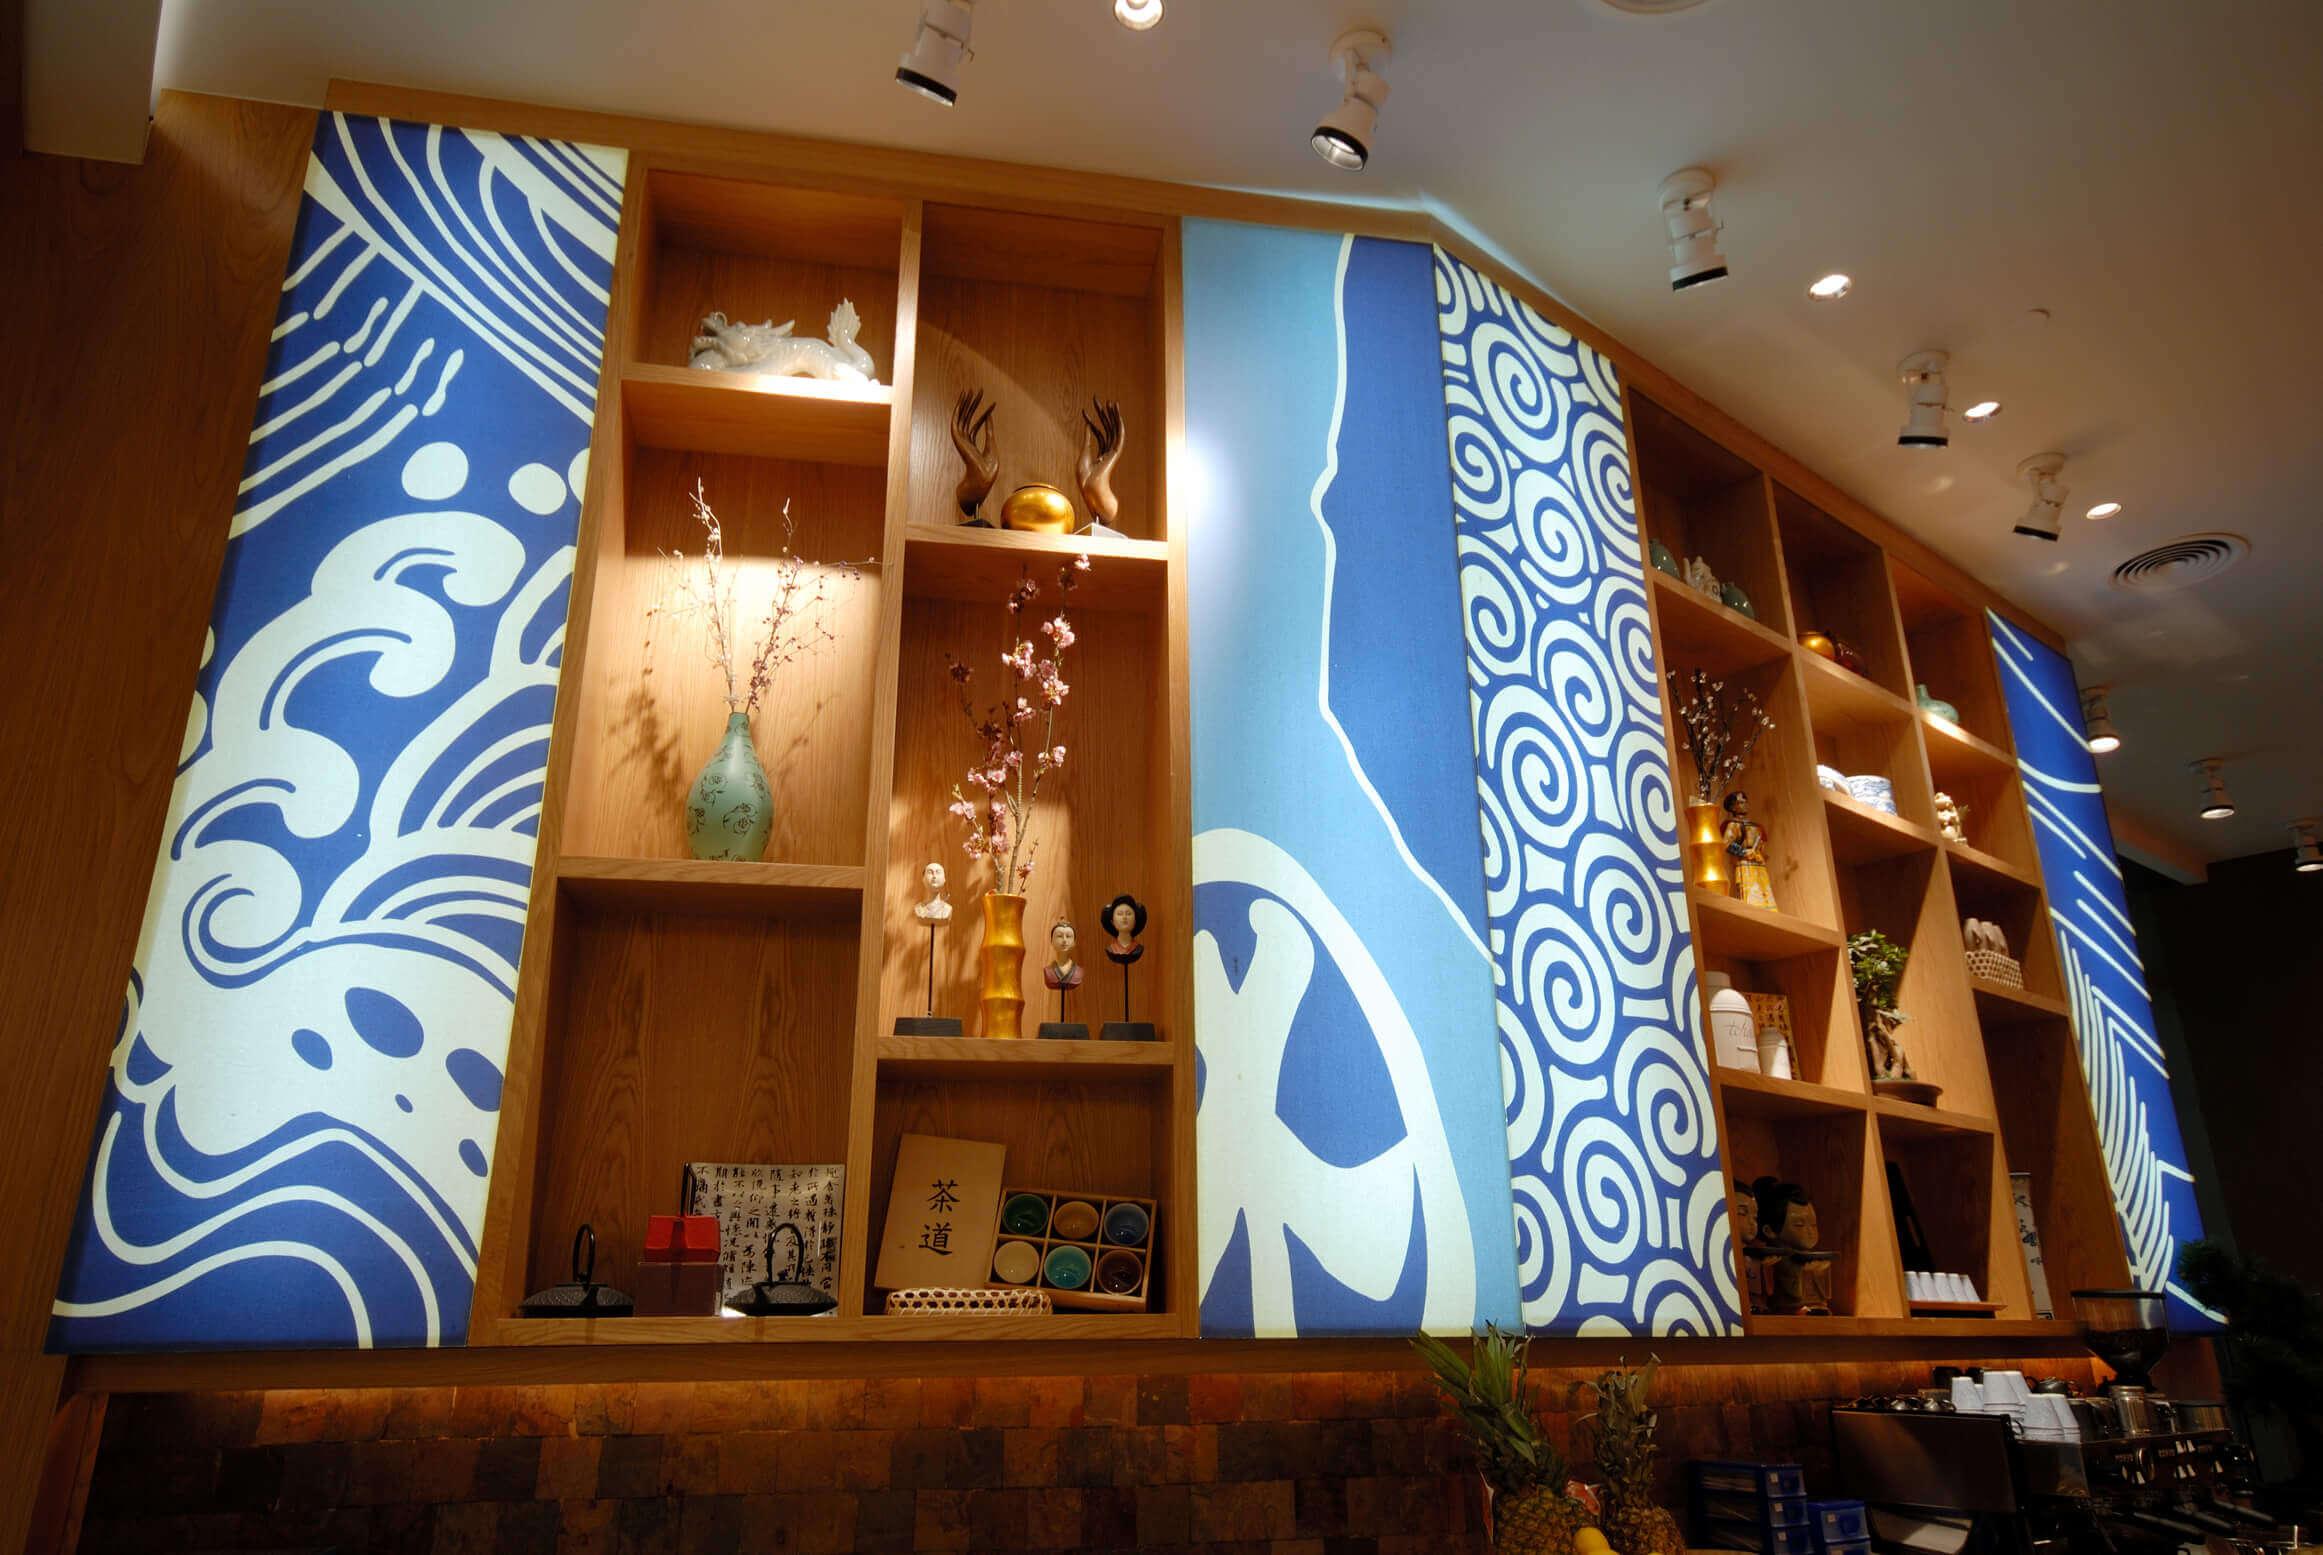 Casual Asian Restaurant and Sushi Bar Interiors - Interior Sense